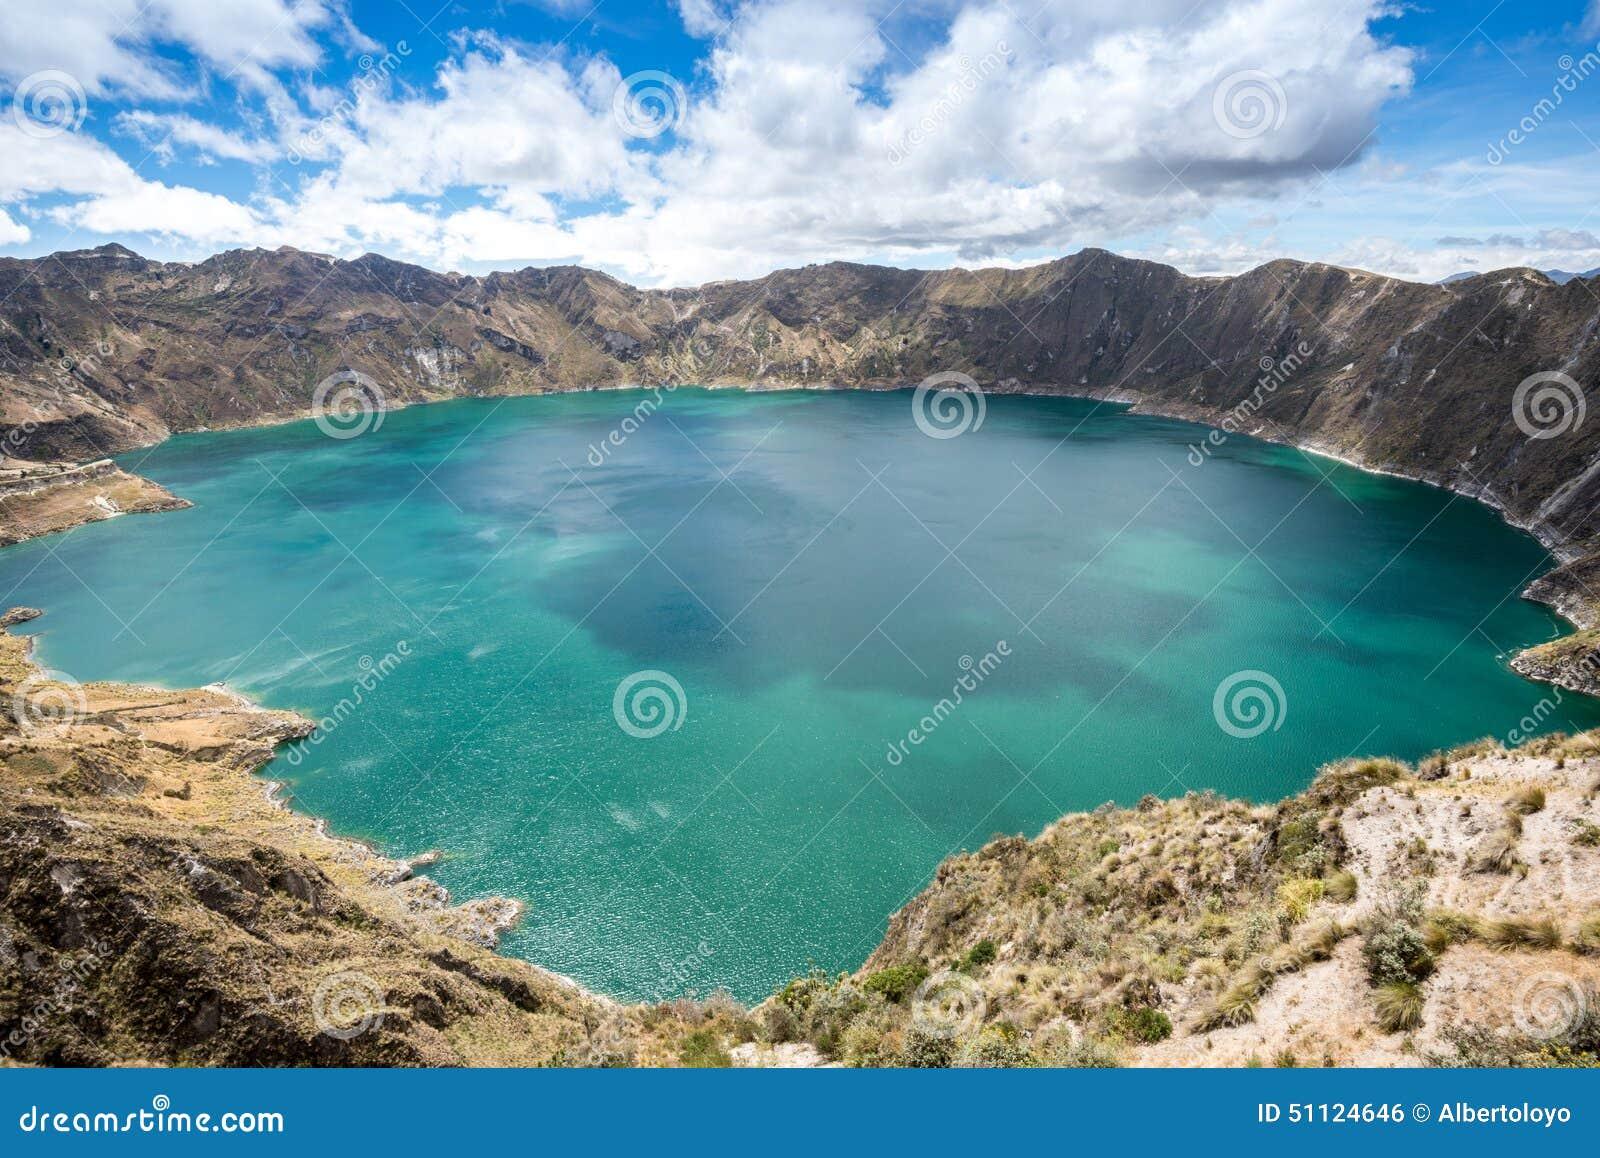 Lac de cratère de Quilotoa, Equateur